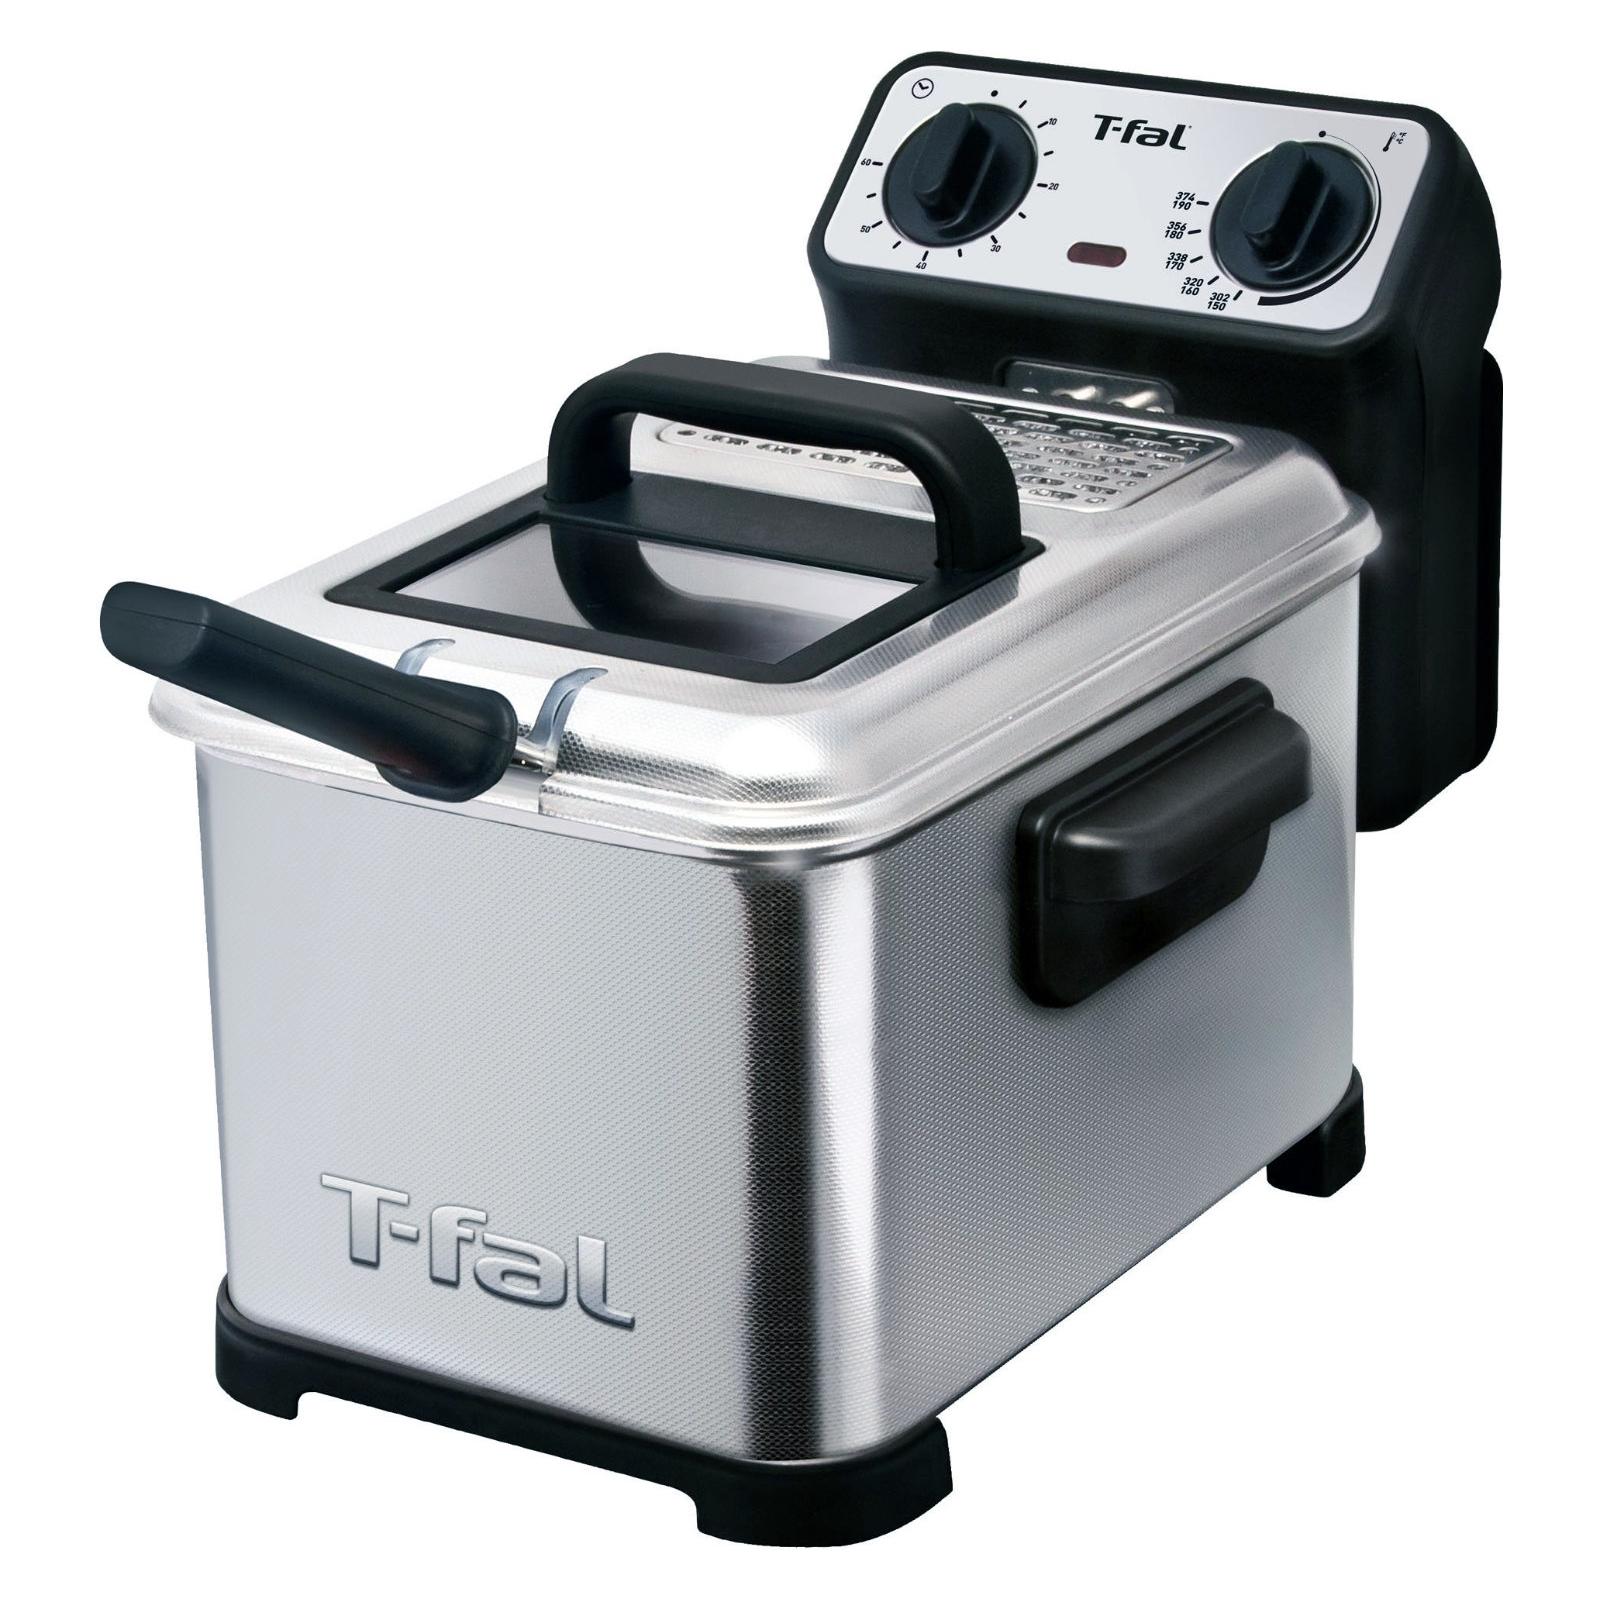 Emeril by T-Fal Family Pro 3 Liter Deep Fryer